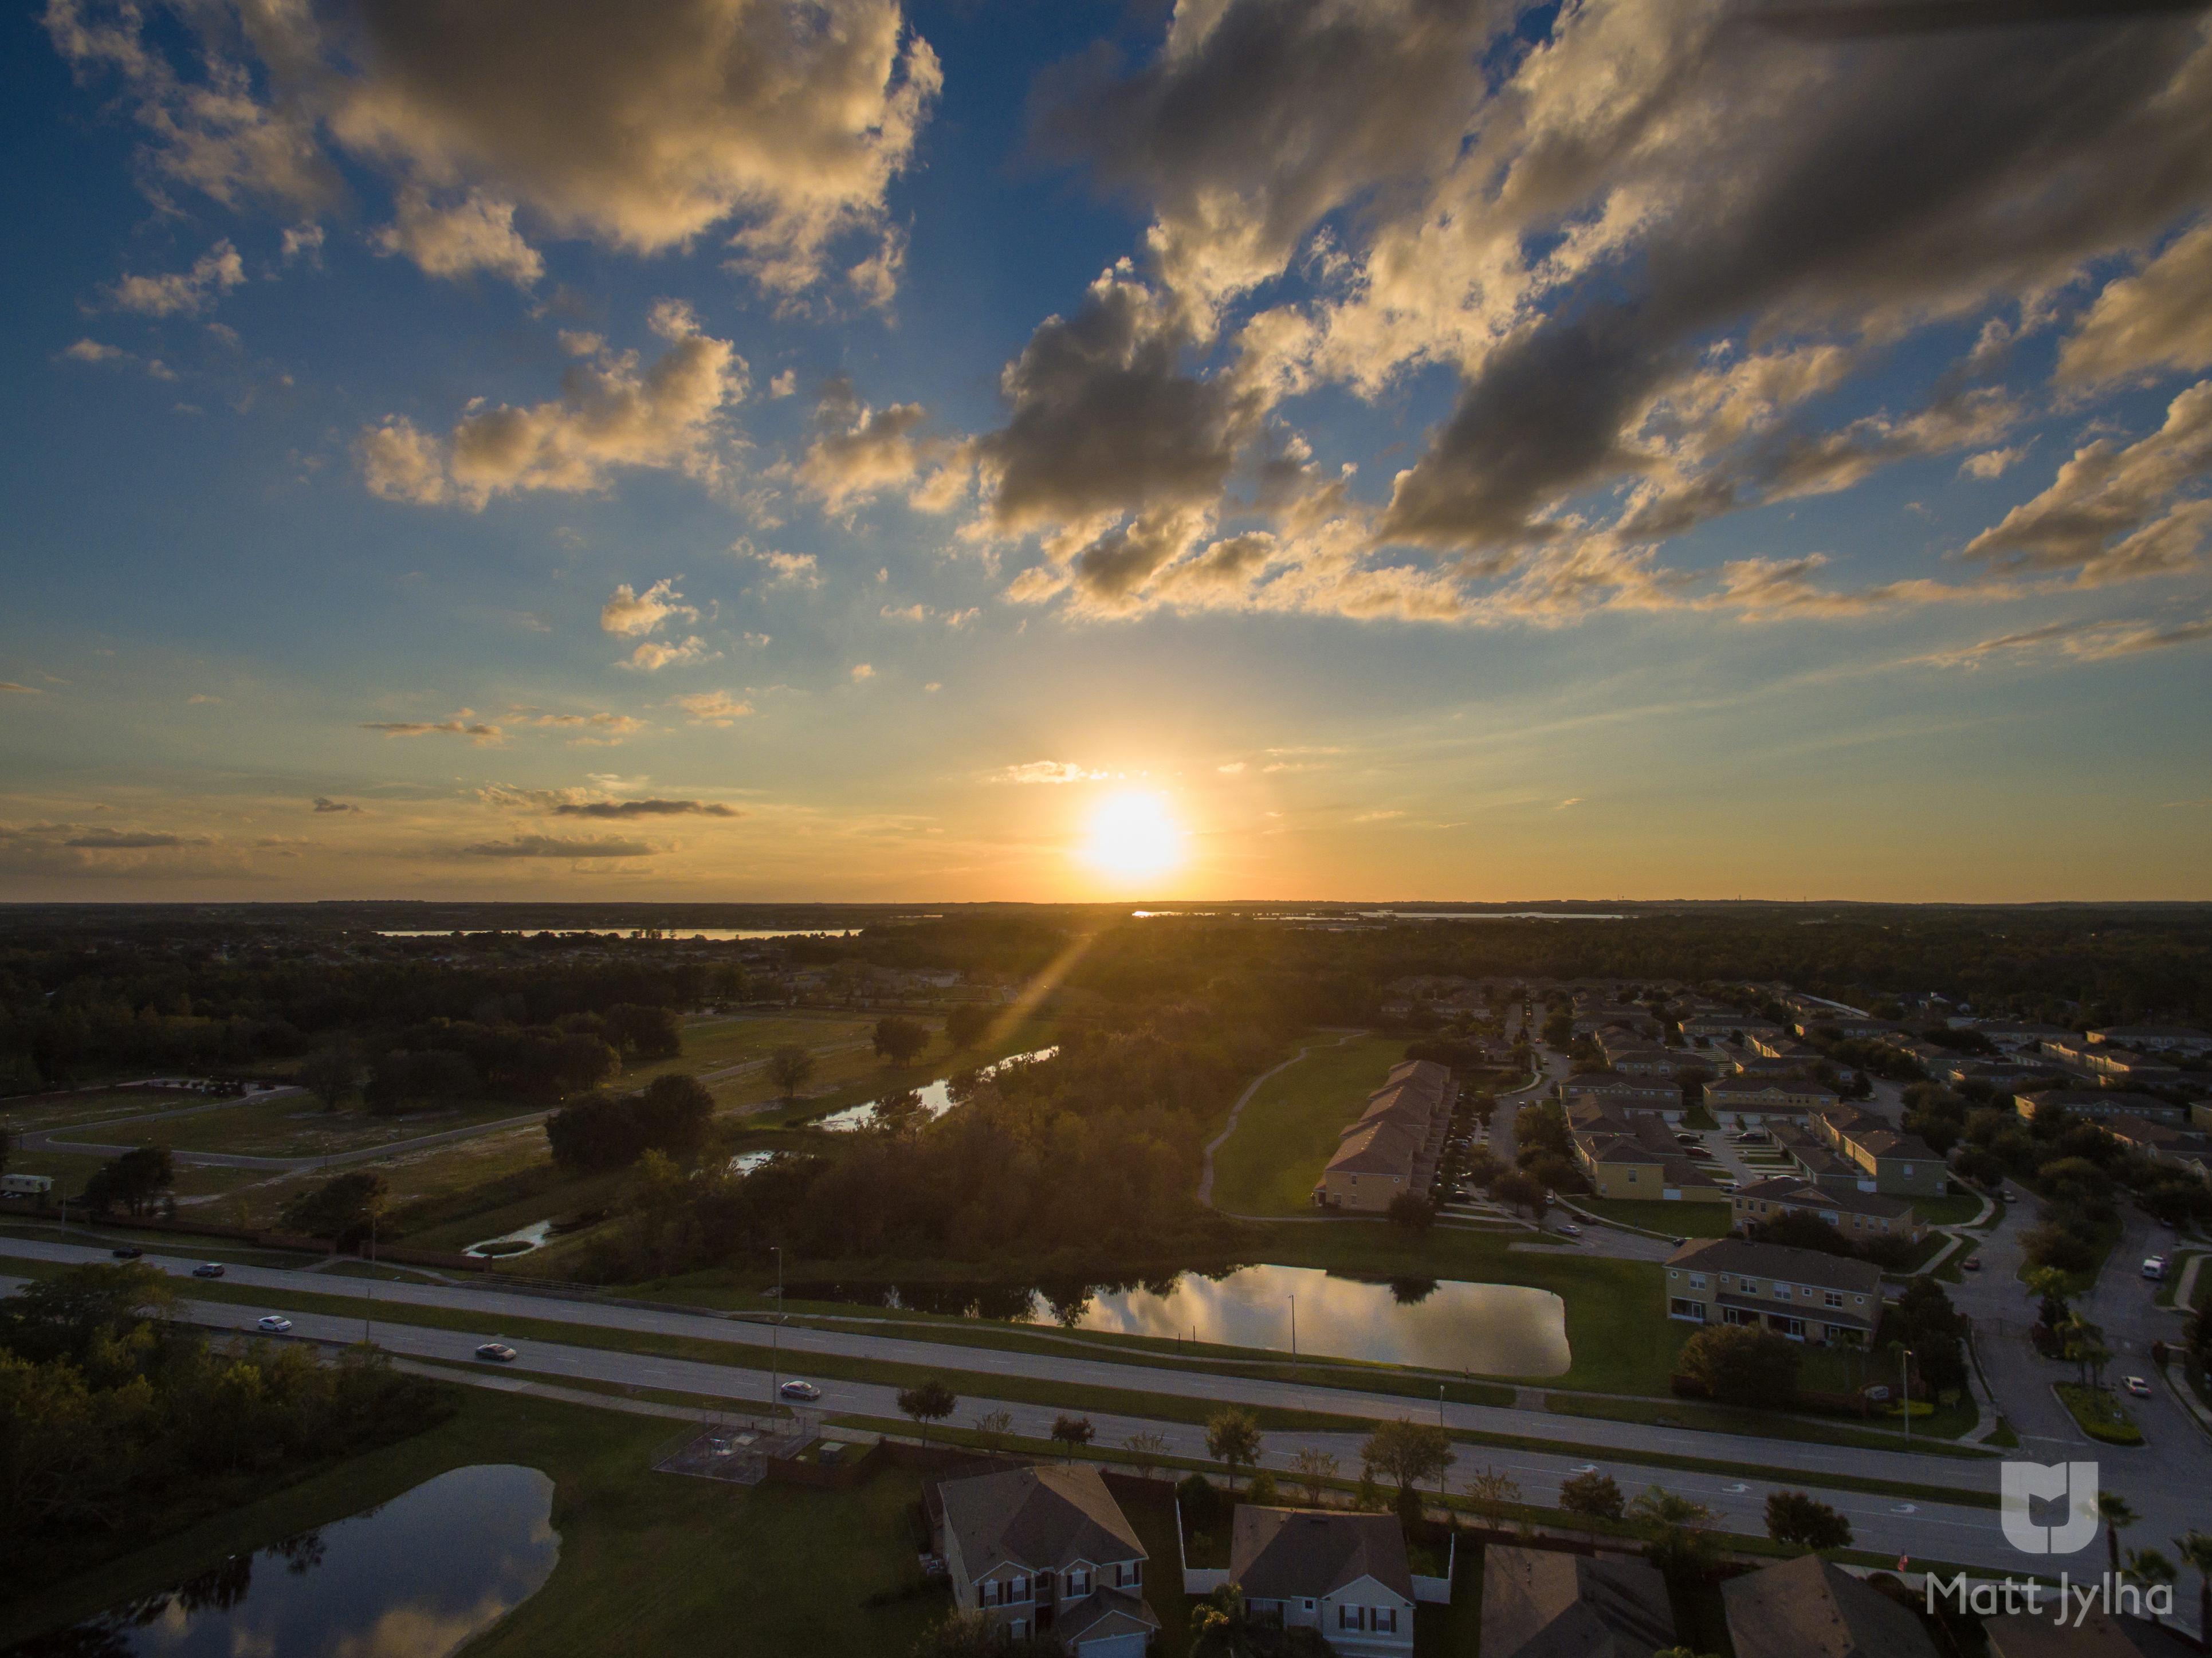 Orlando_Aerial_Photographer_Matt_Jylha_006